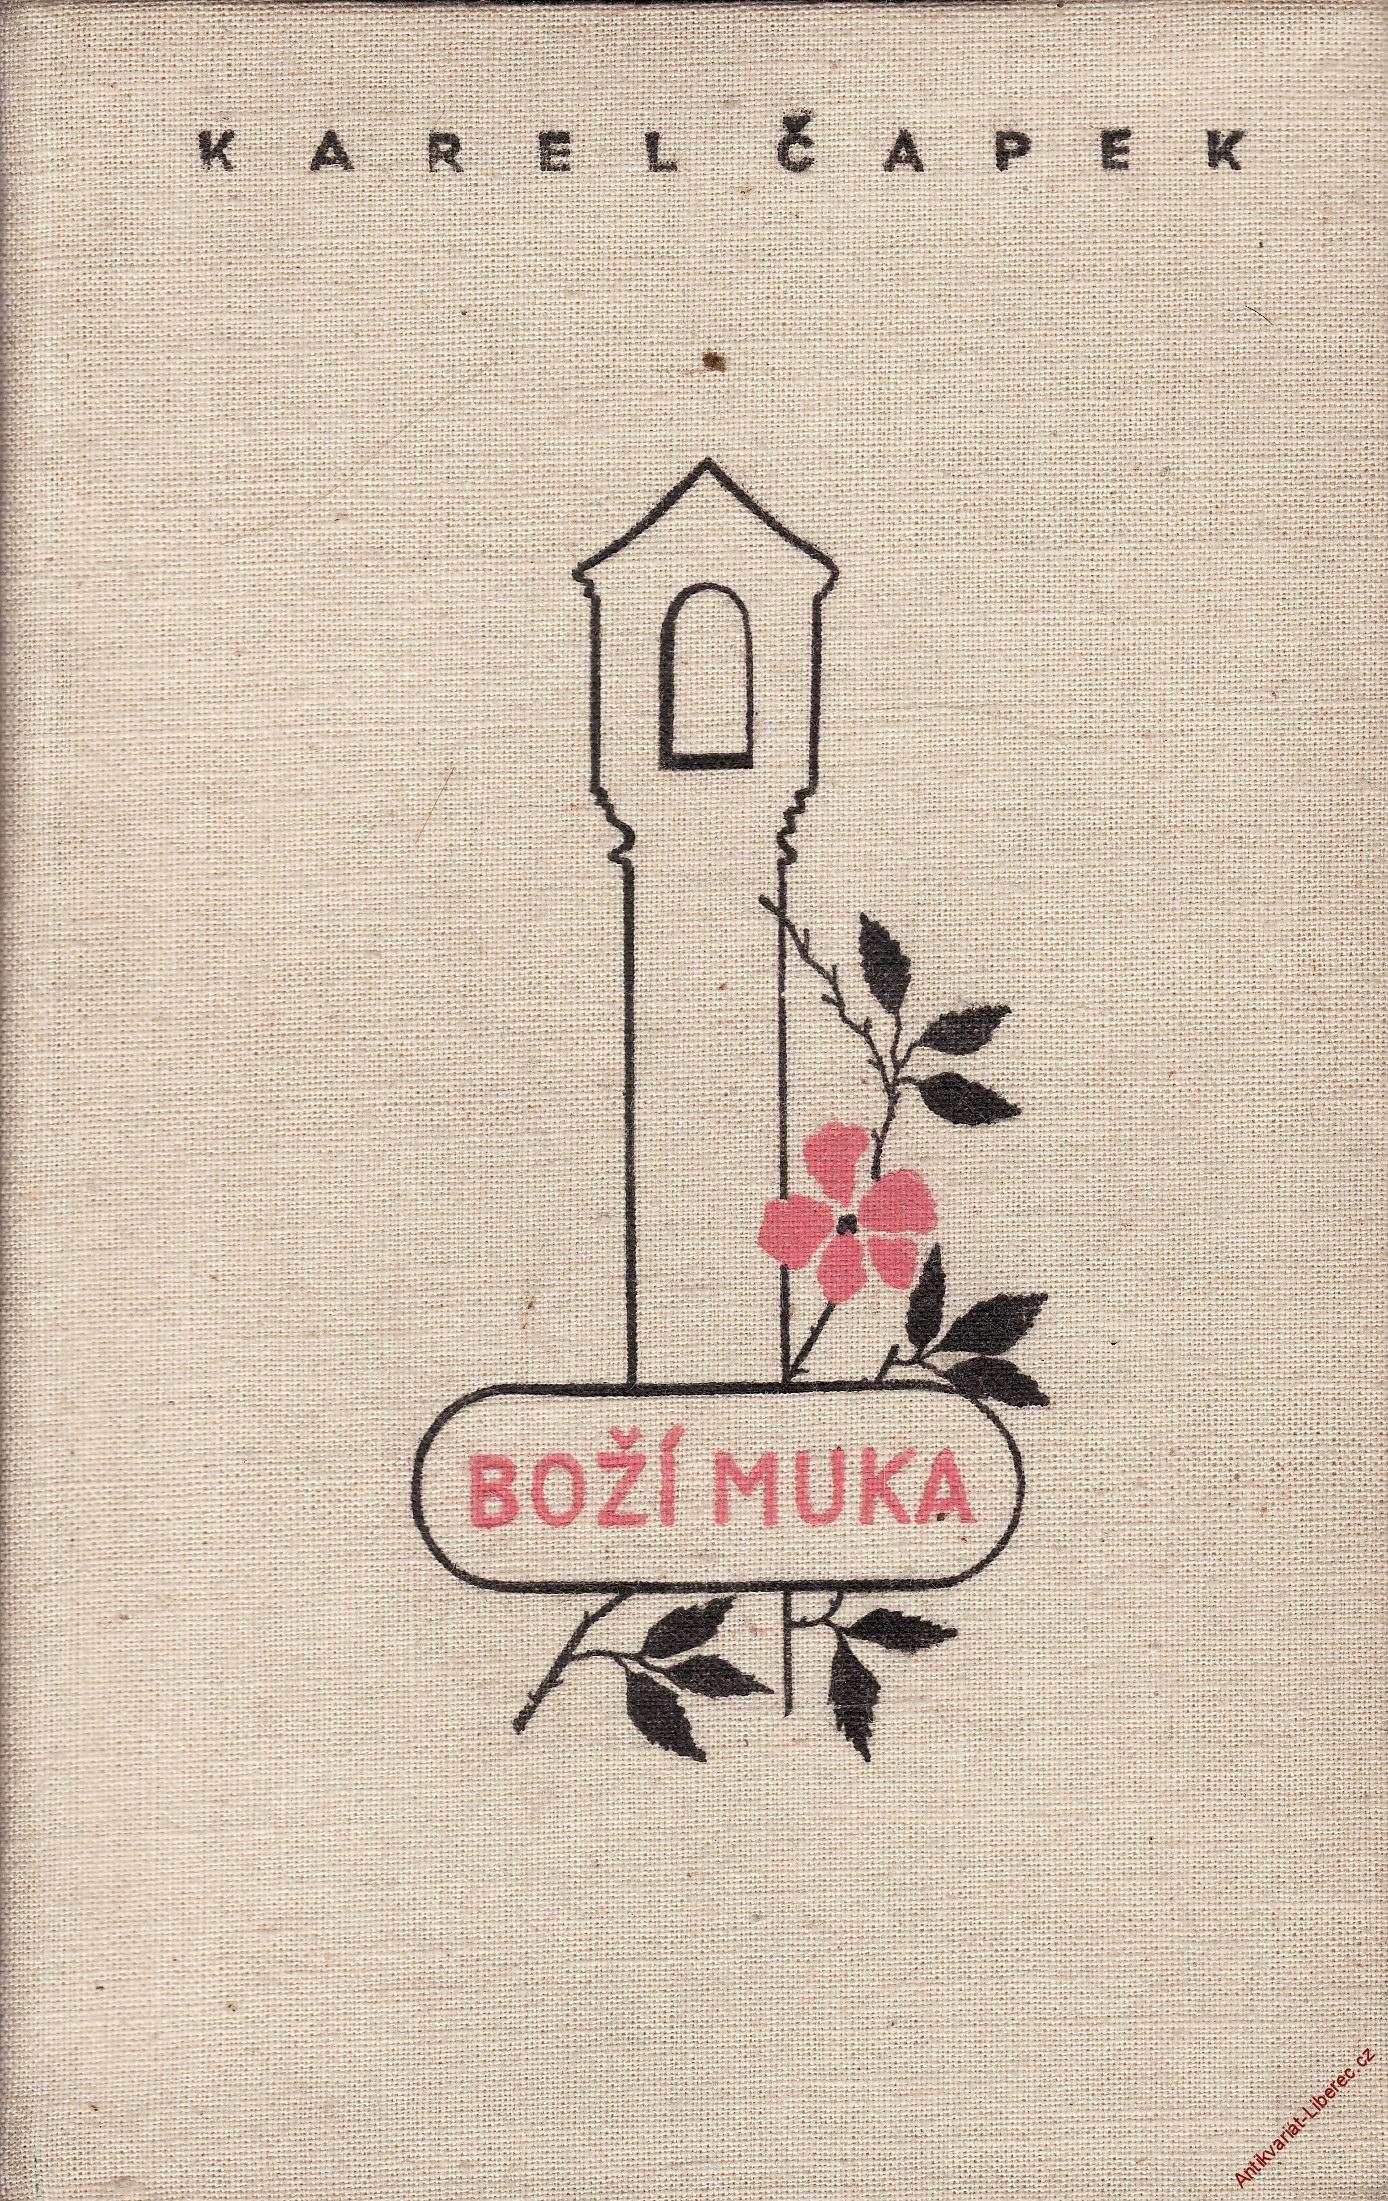 Boží muka / Karel Čapek, 1941